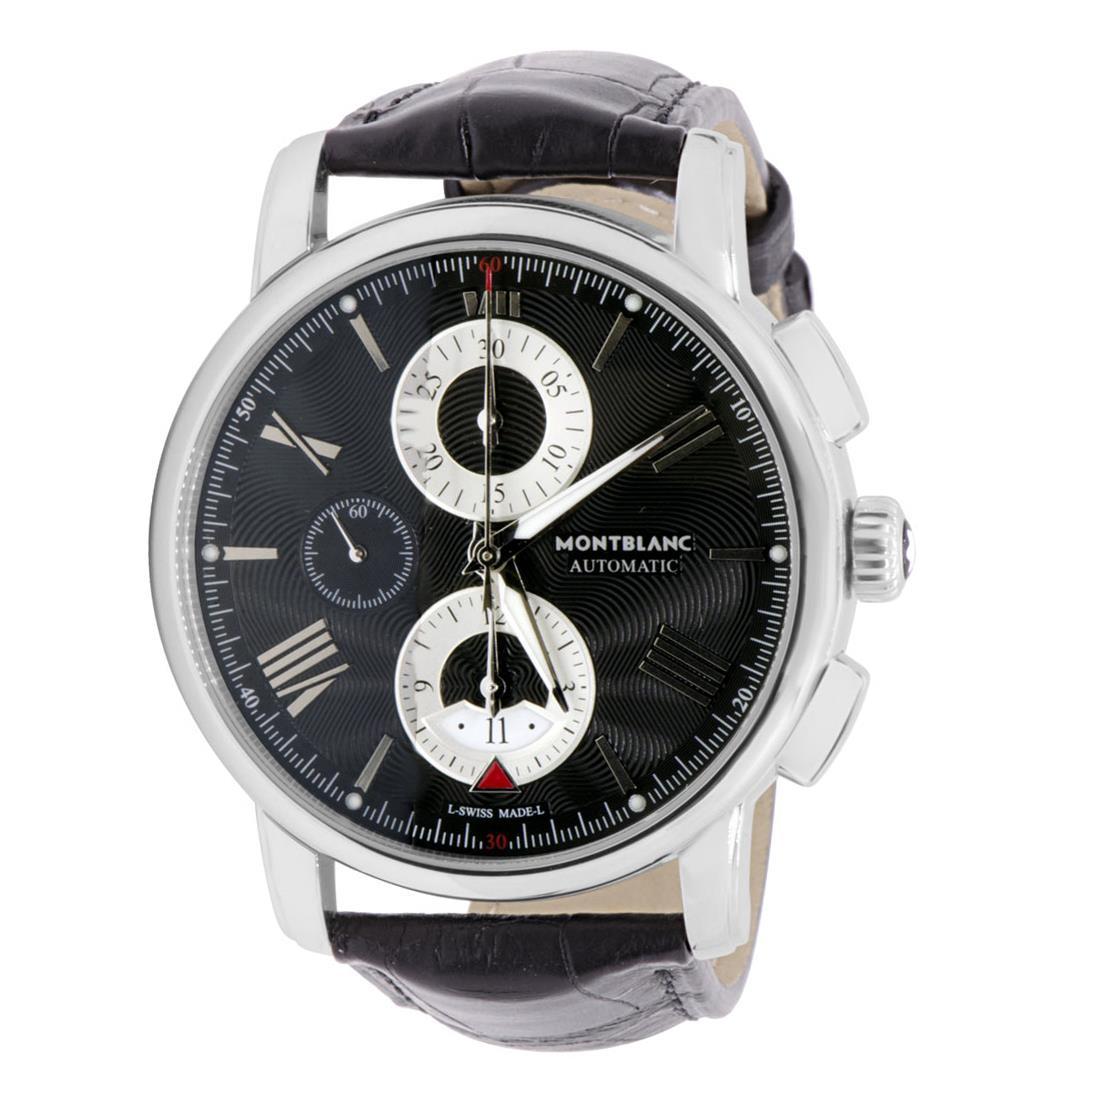 Orologio Montblanc 4810 - MONTBLANC